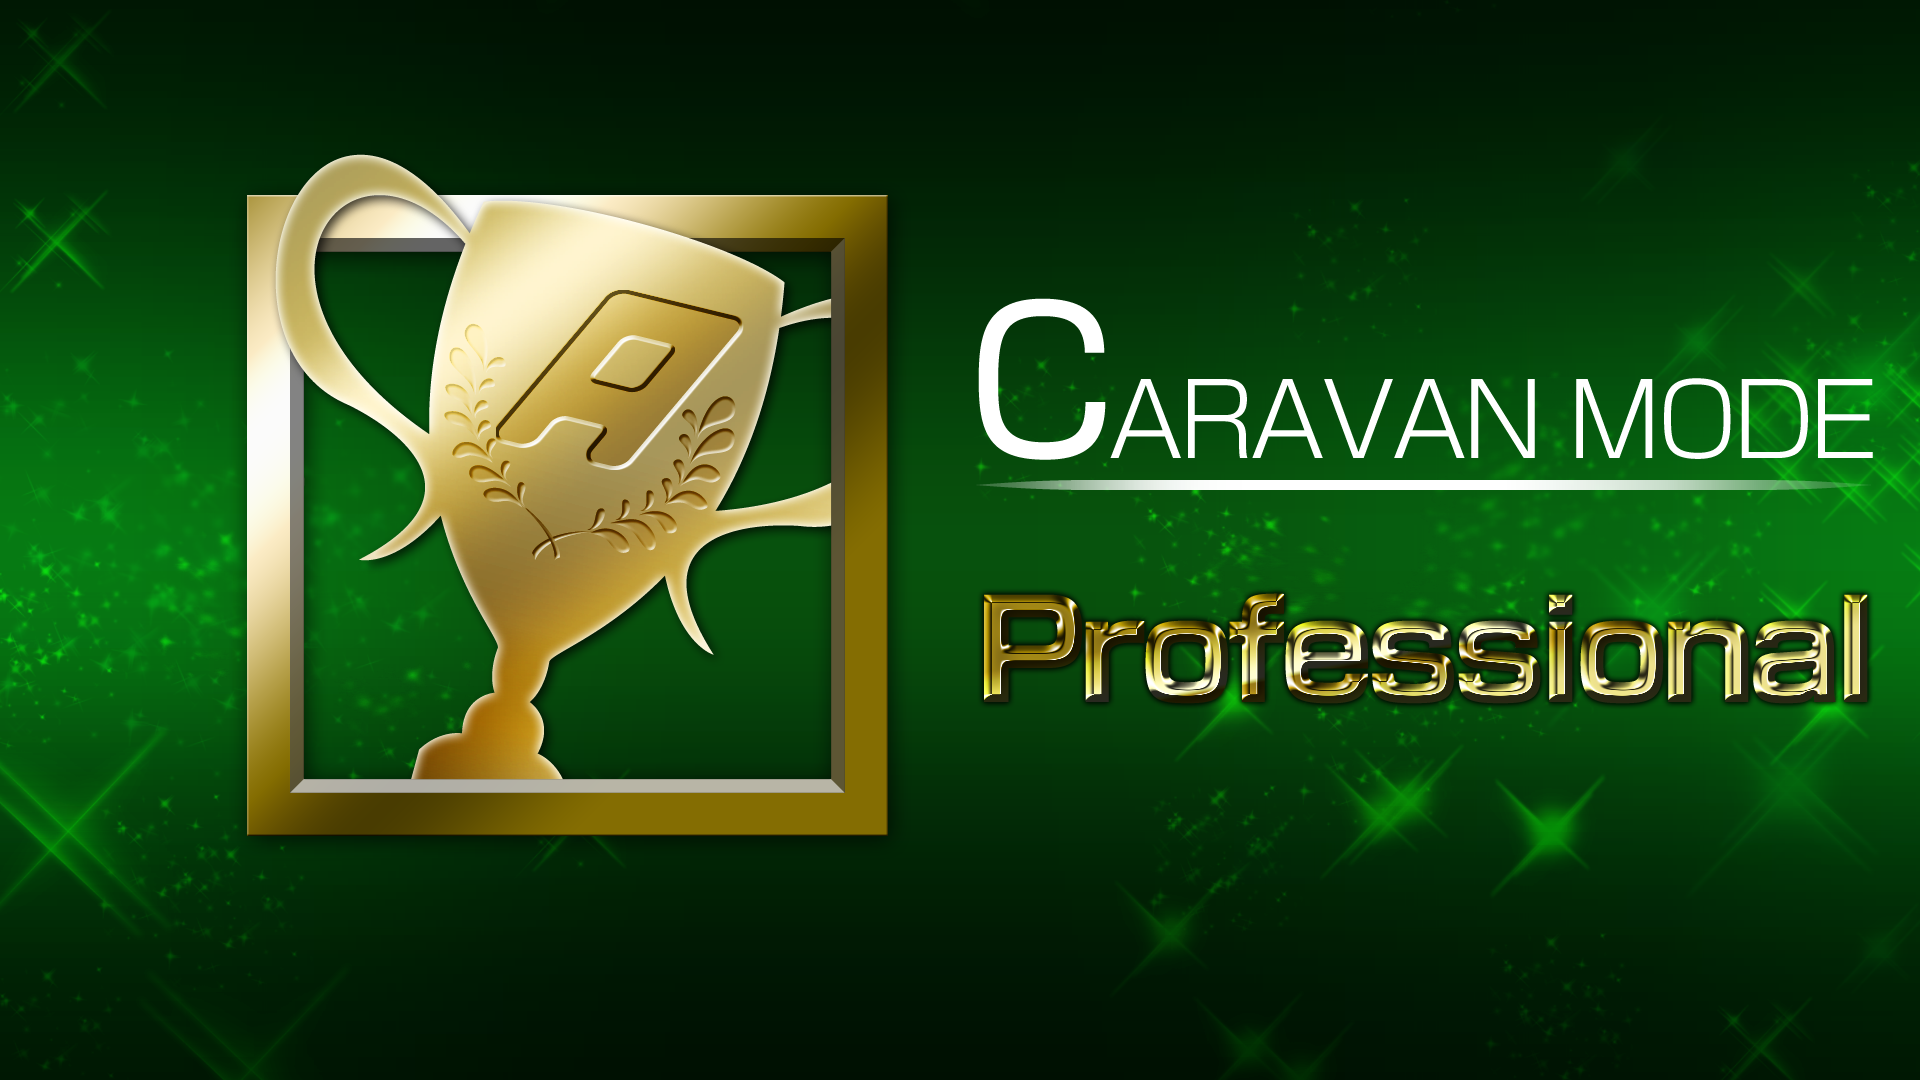 Icon for CARAVAN MODE 3,000,000 points